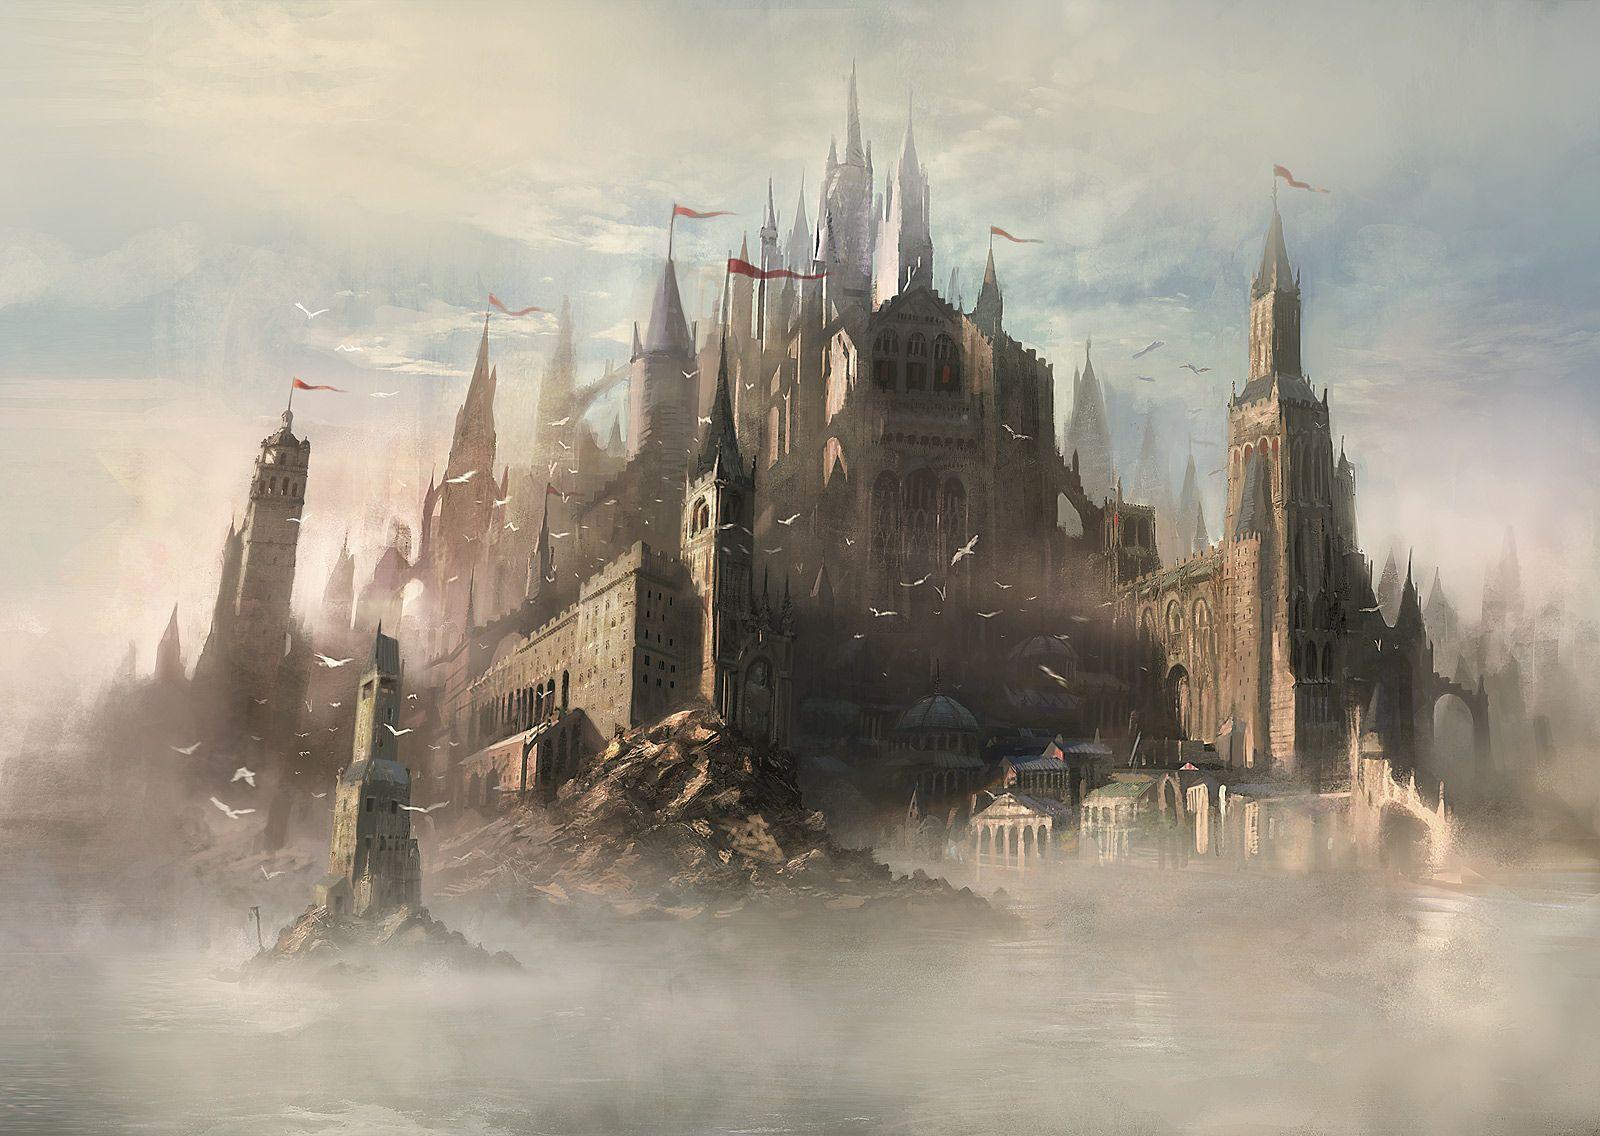 landscapes castles fantasy art - photo #36